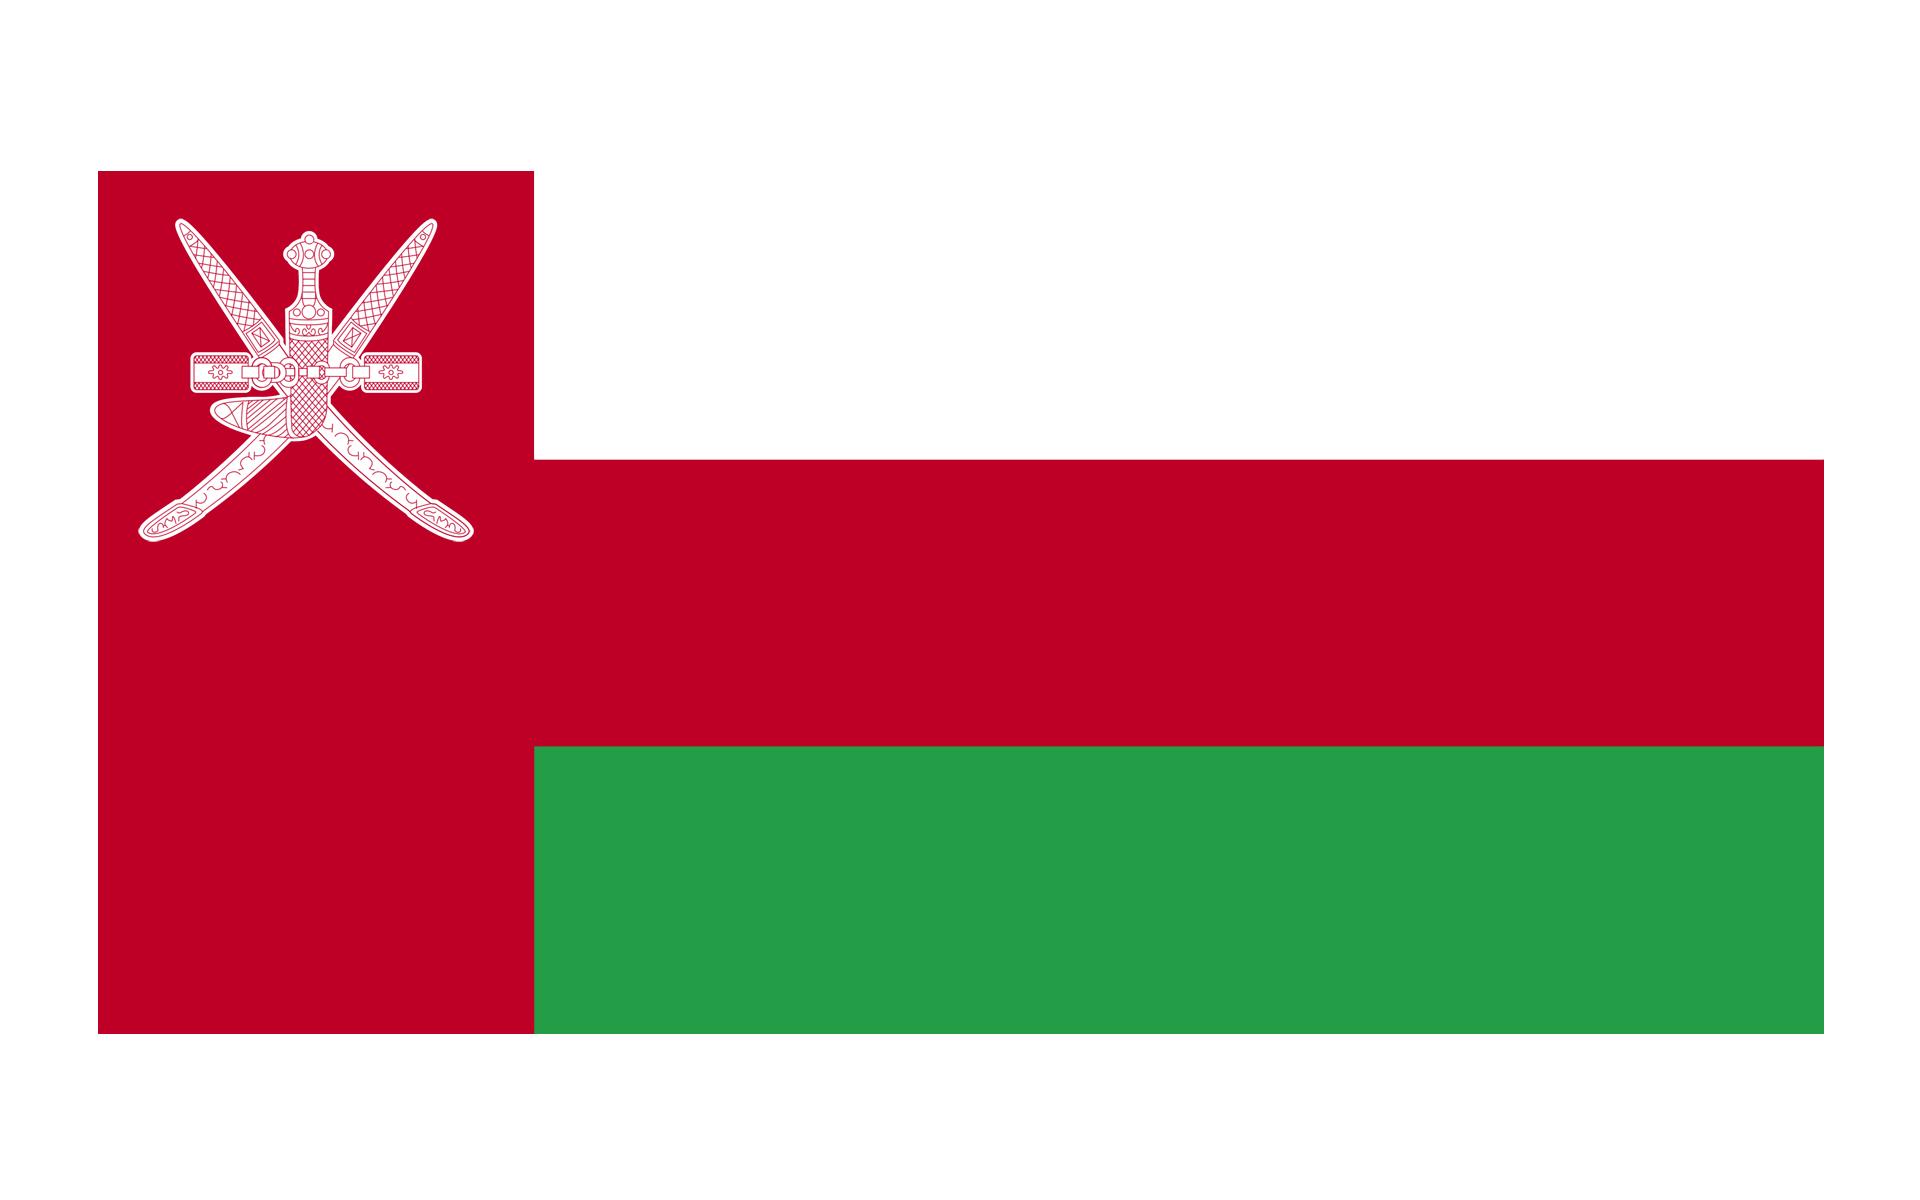 The Mardyke To Host Oman Cricket Association T20